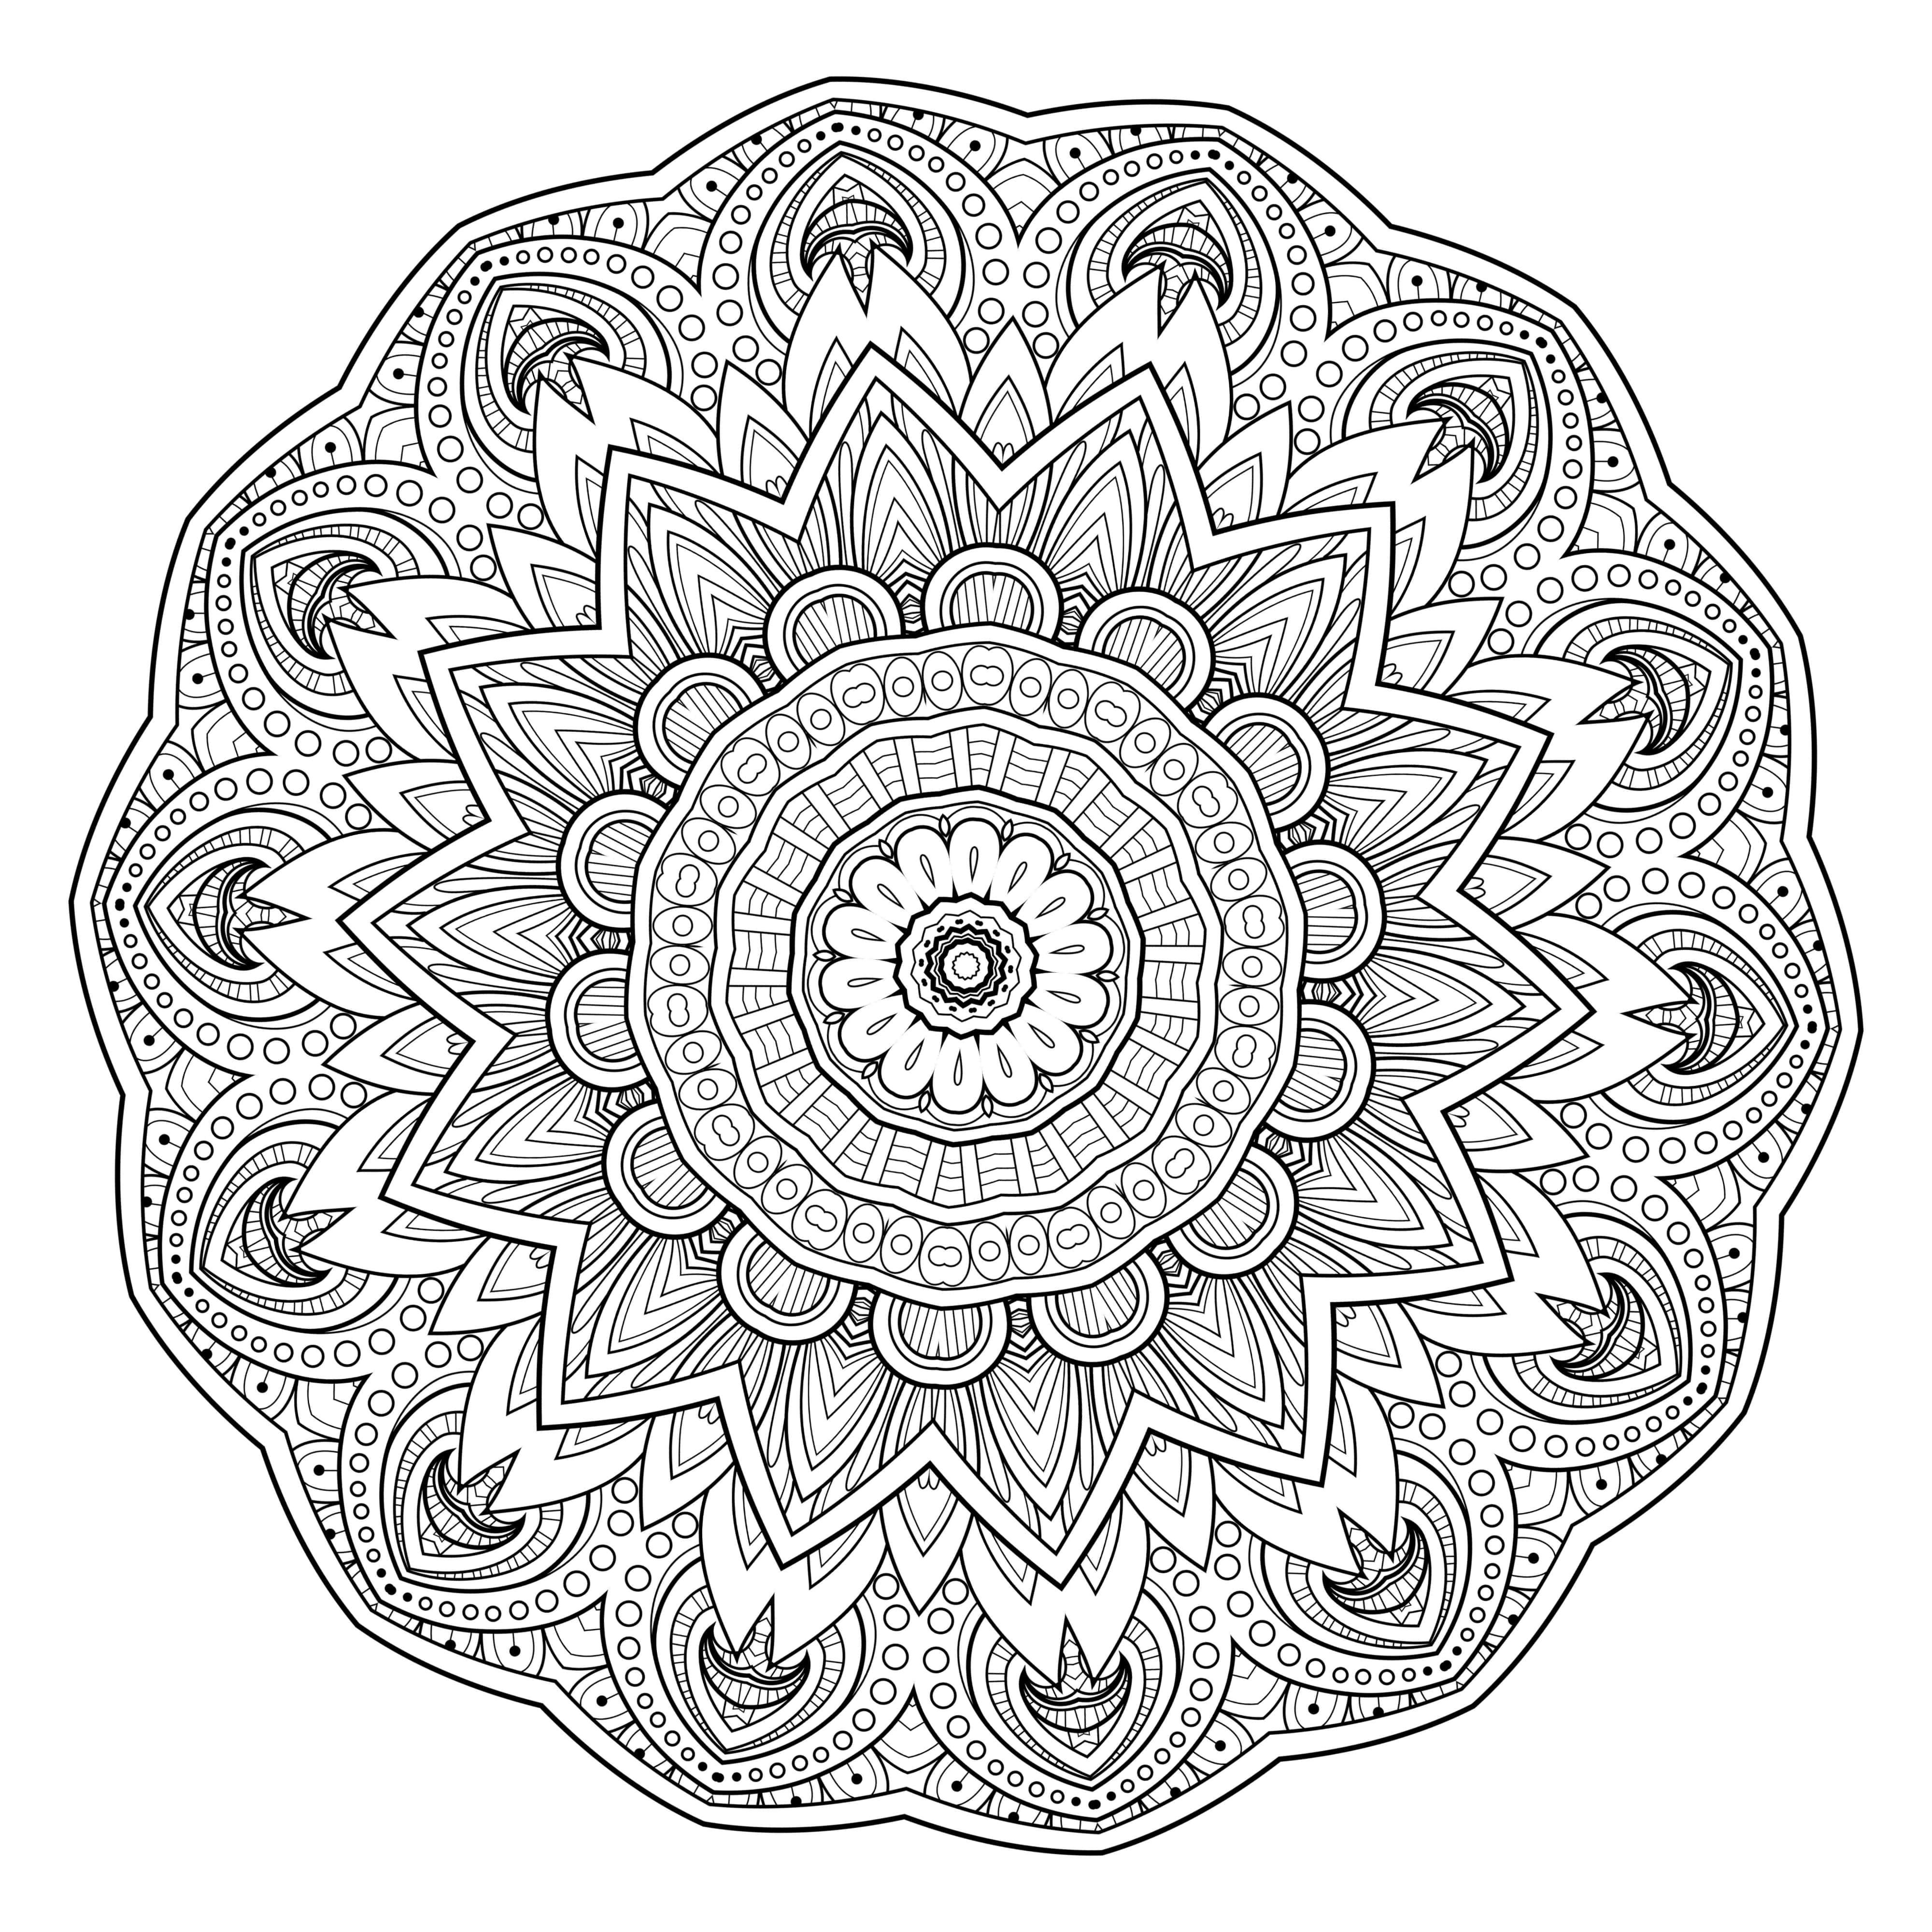 5 Free Printable Coloring Pages: Mandala Templates Intérieur - Free Printable Mandalas